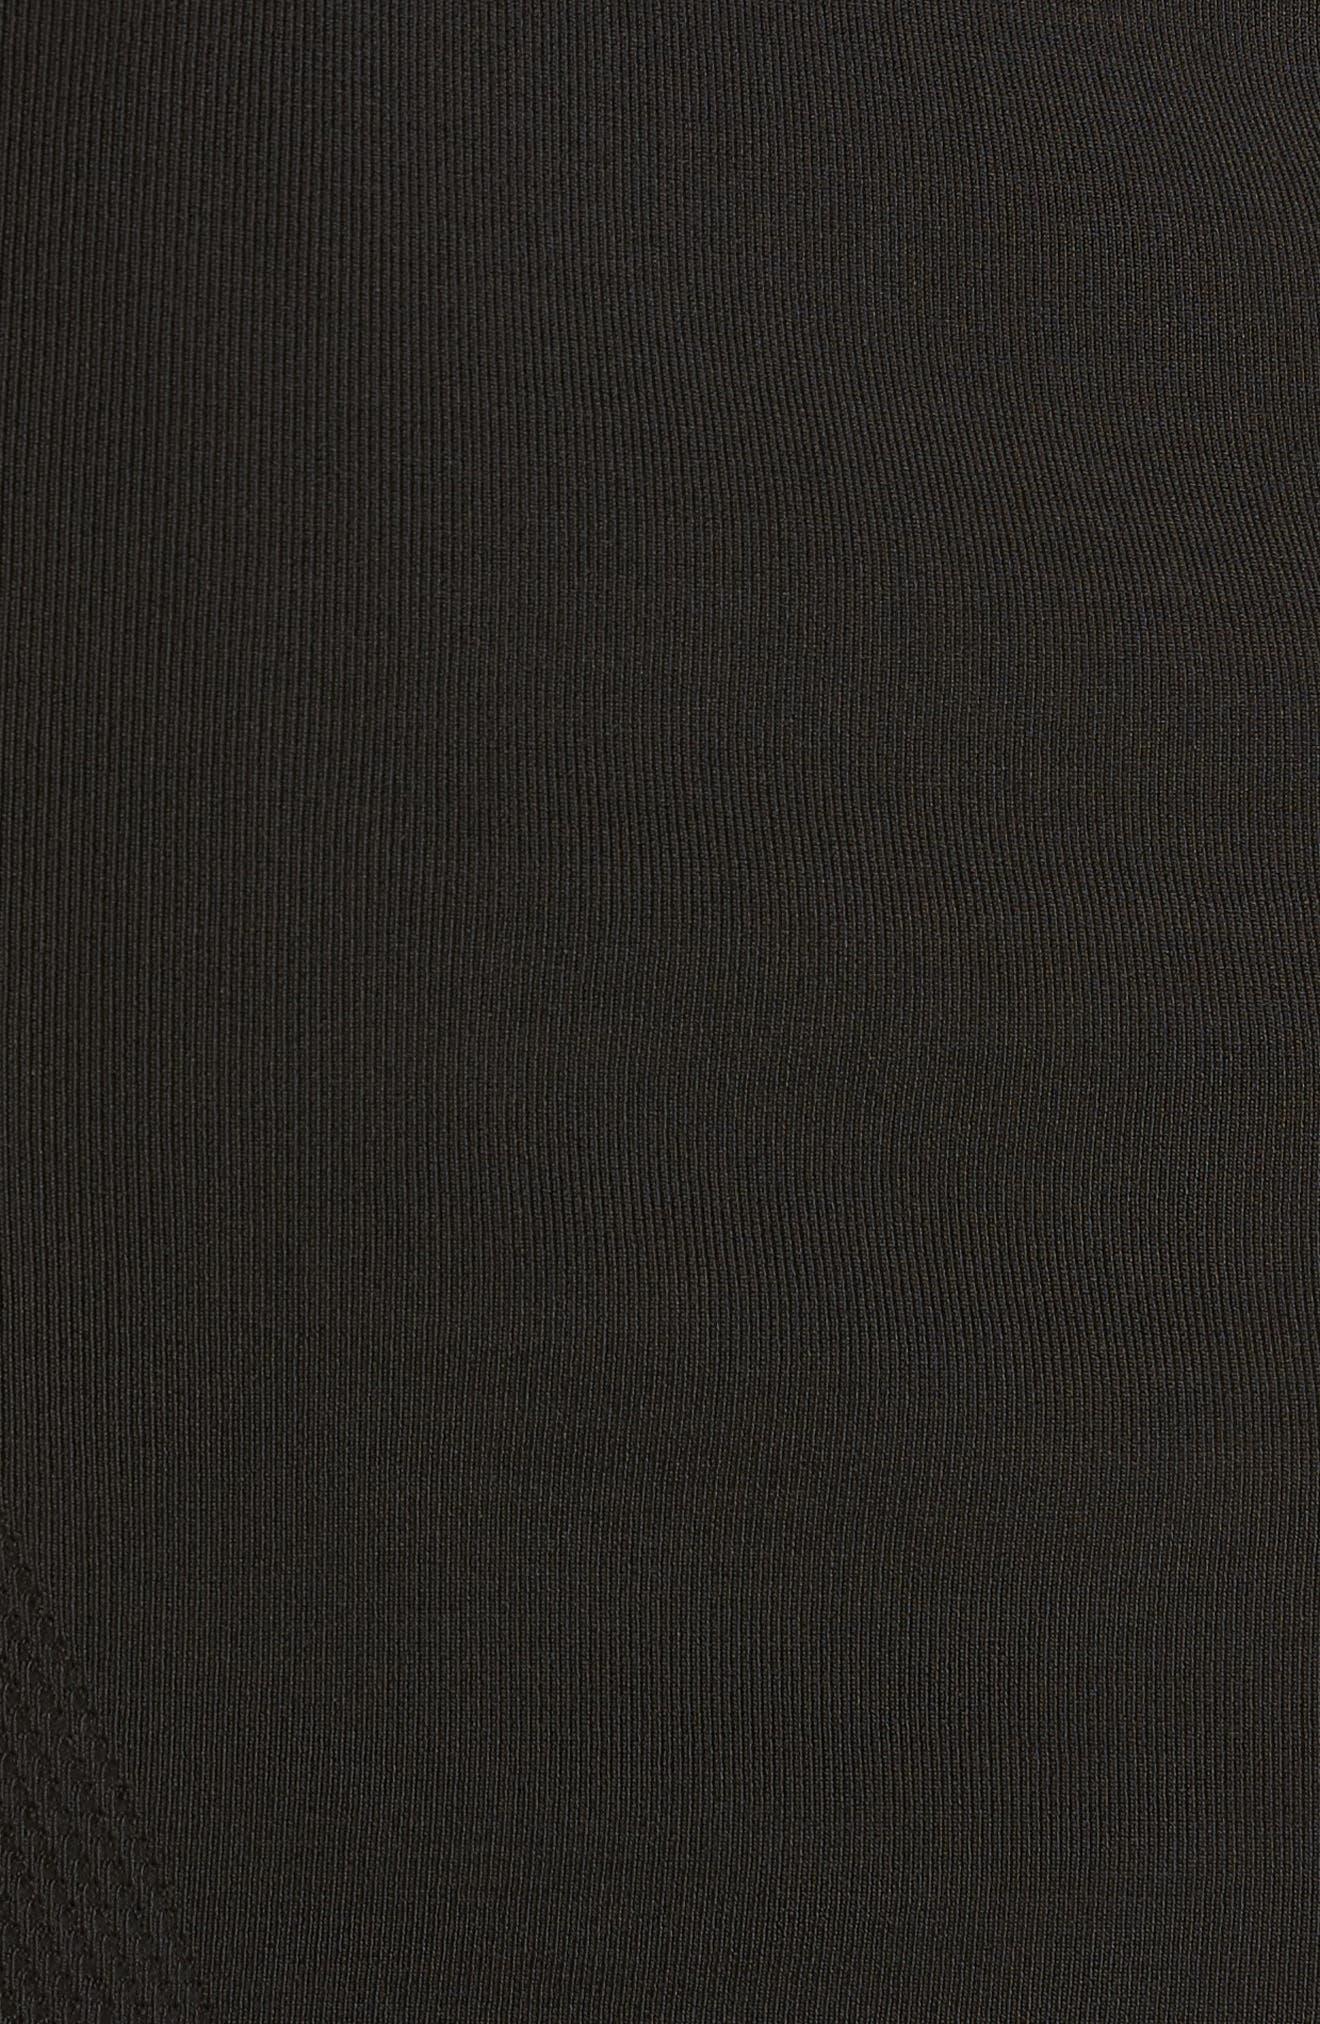 Sweater Pencil Skirt,                             Alternate thumbnail 5, color,                             001